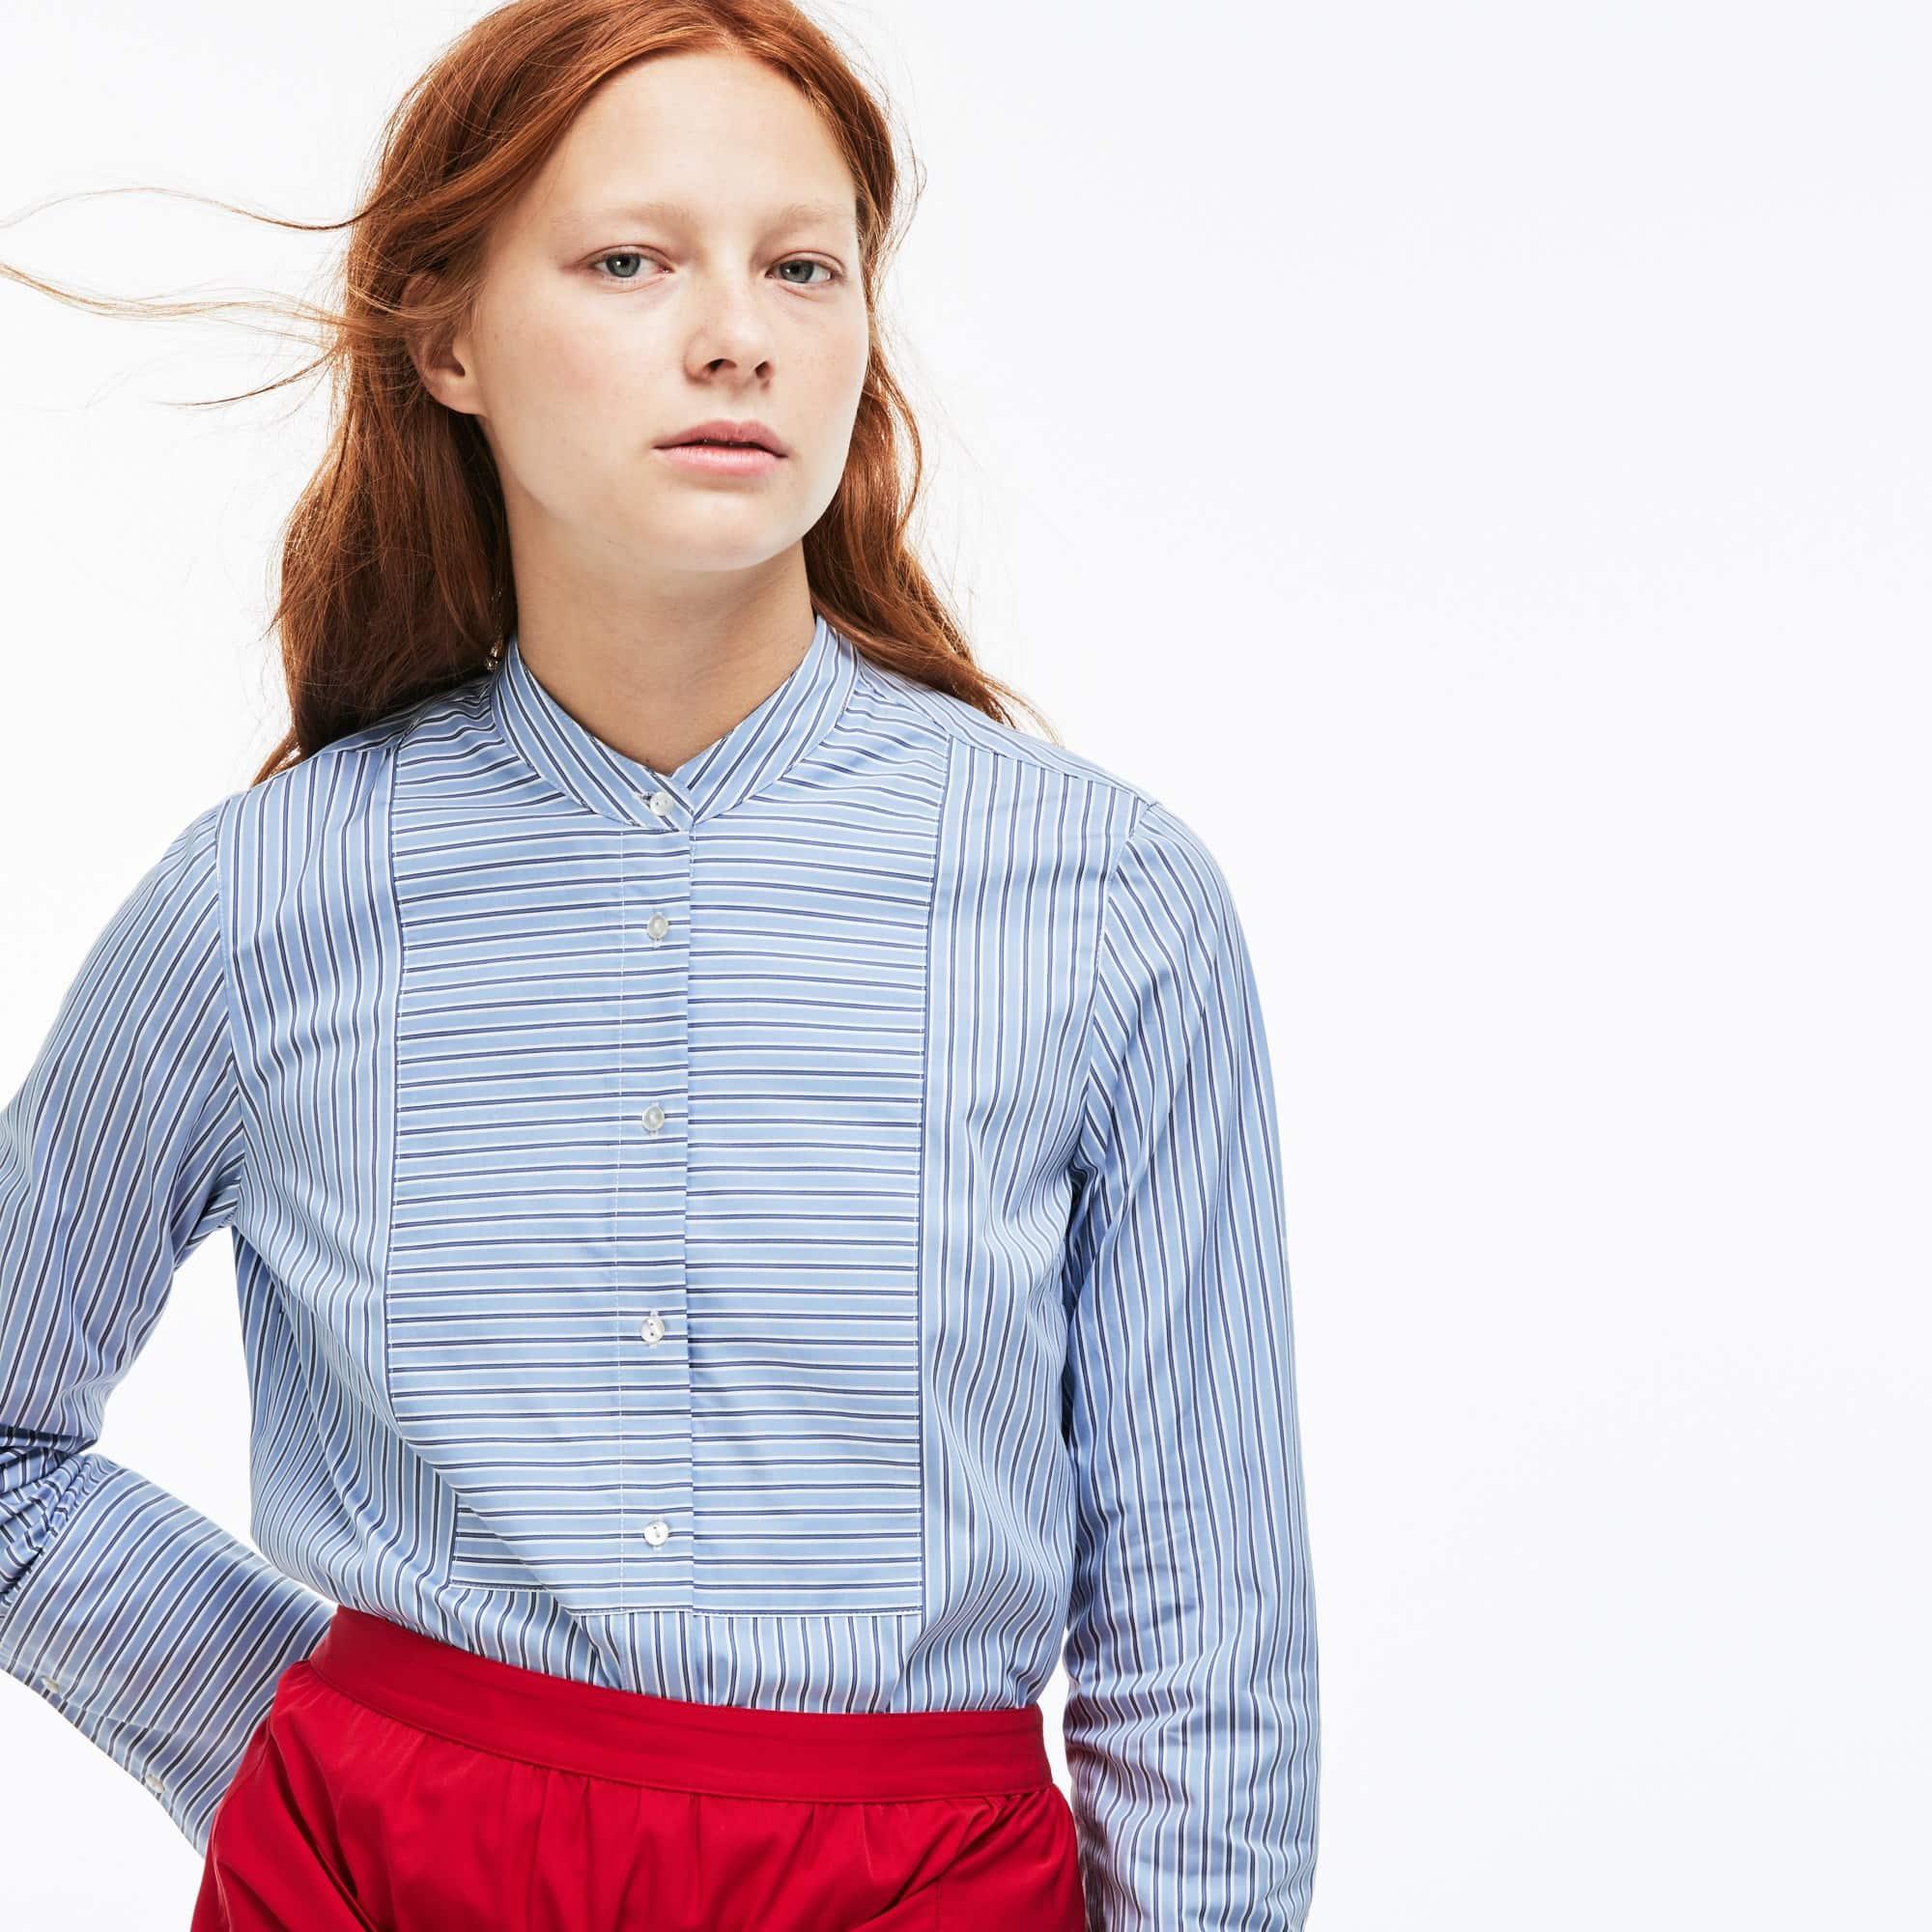 Women's Lacoste LIVE Boxy Fit Striped Poplin Shirt